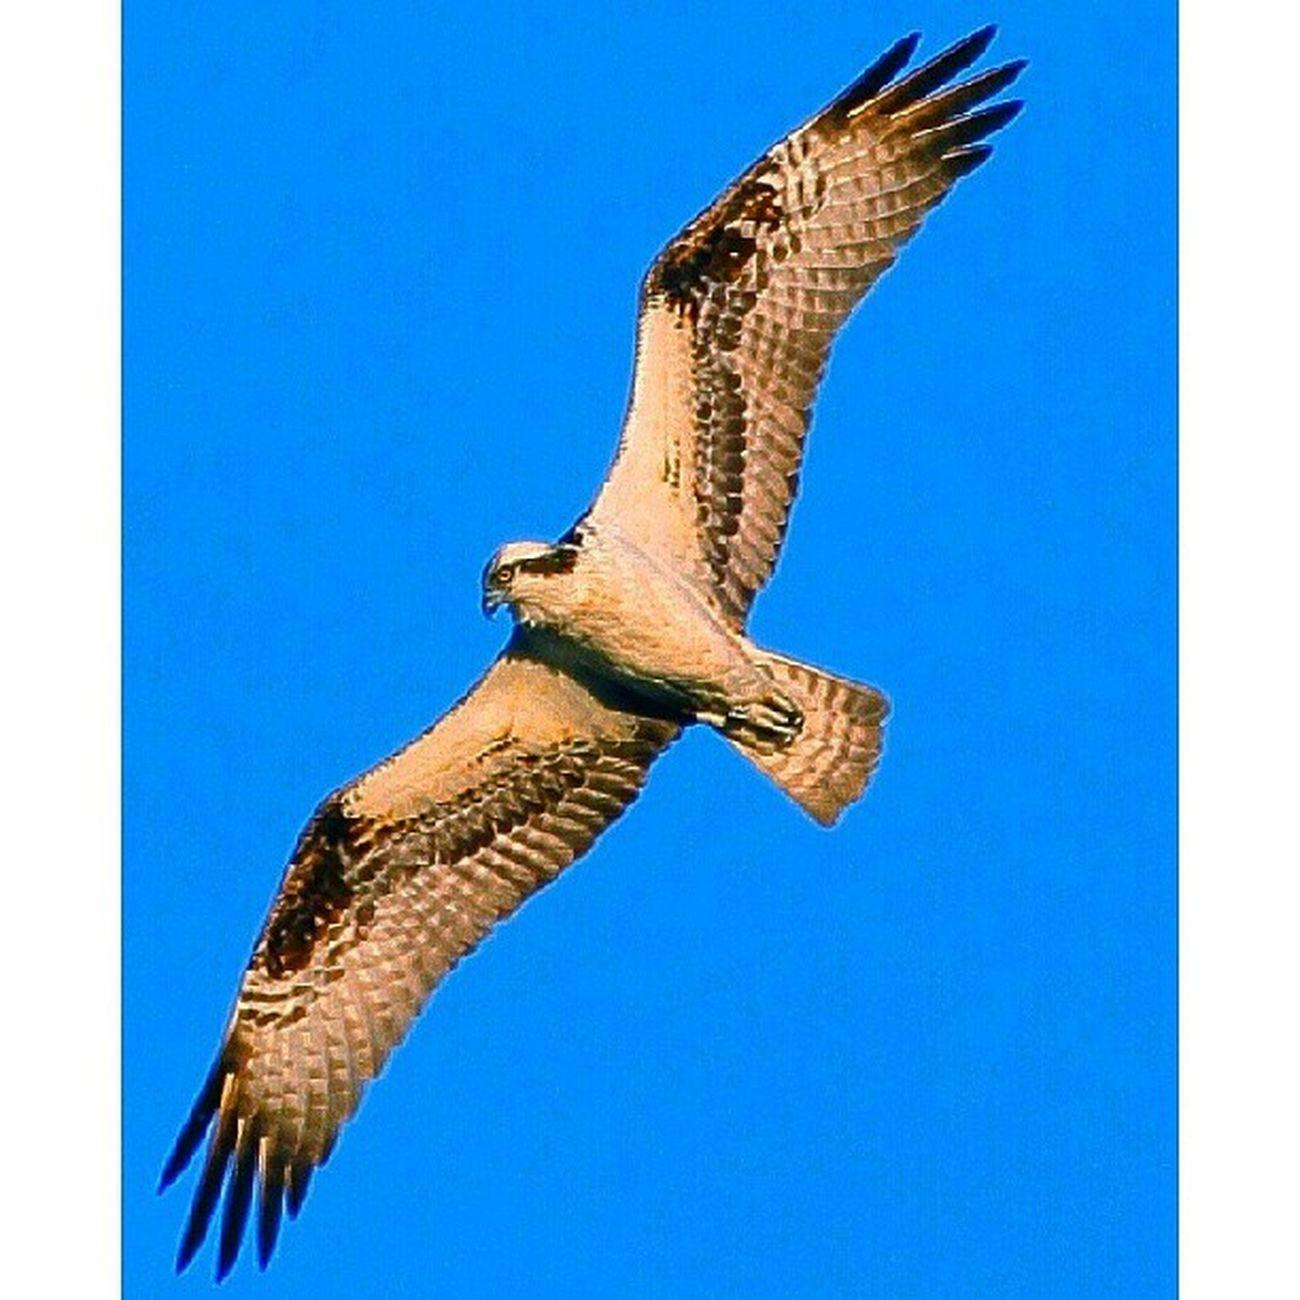 Osprey Amazing_birds Allmightybirds Birds_n_branches Birdfreaks fabfaunas feather_perfection feather_features nuts_about_birds nature_perfection underdogs_feathers whatschirping wildlife_perfection